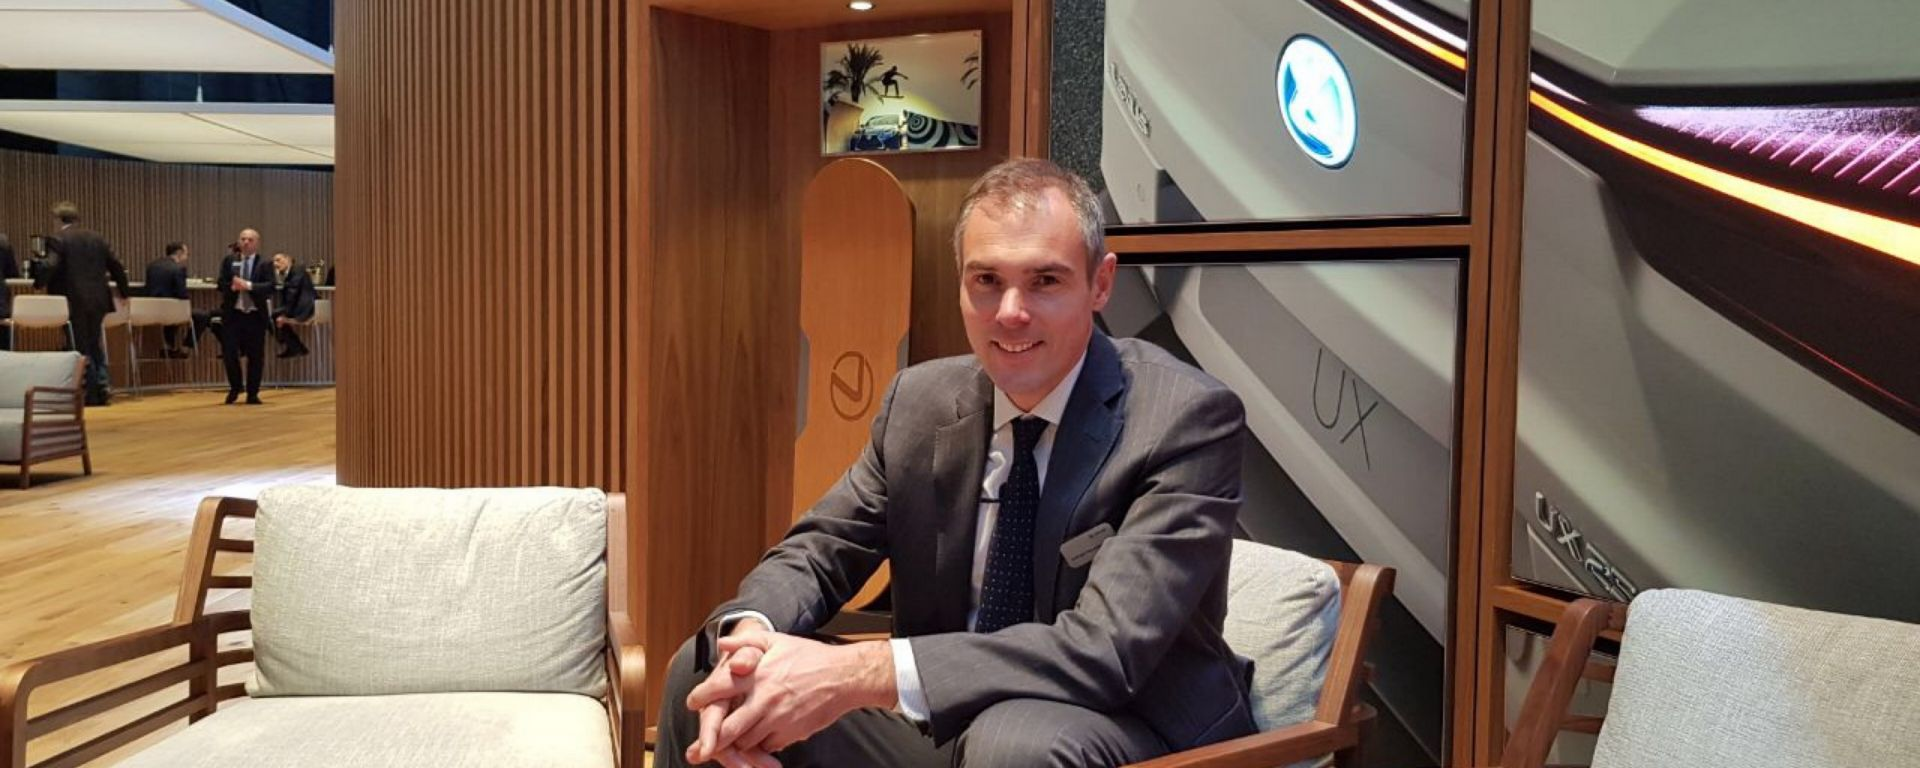 Vincent Van Acker, Lexus Division General Manager